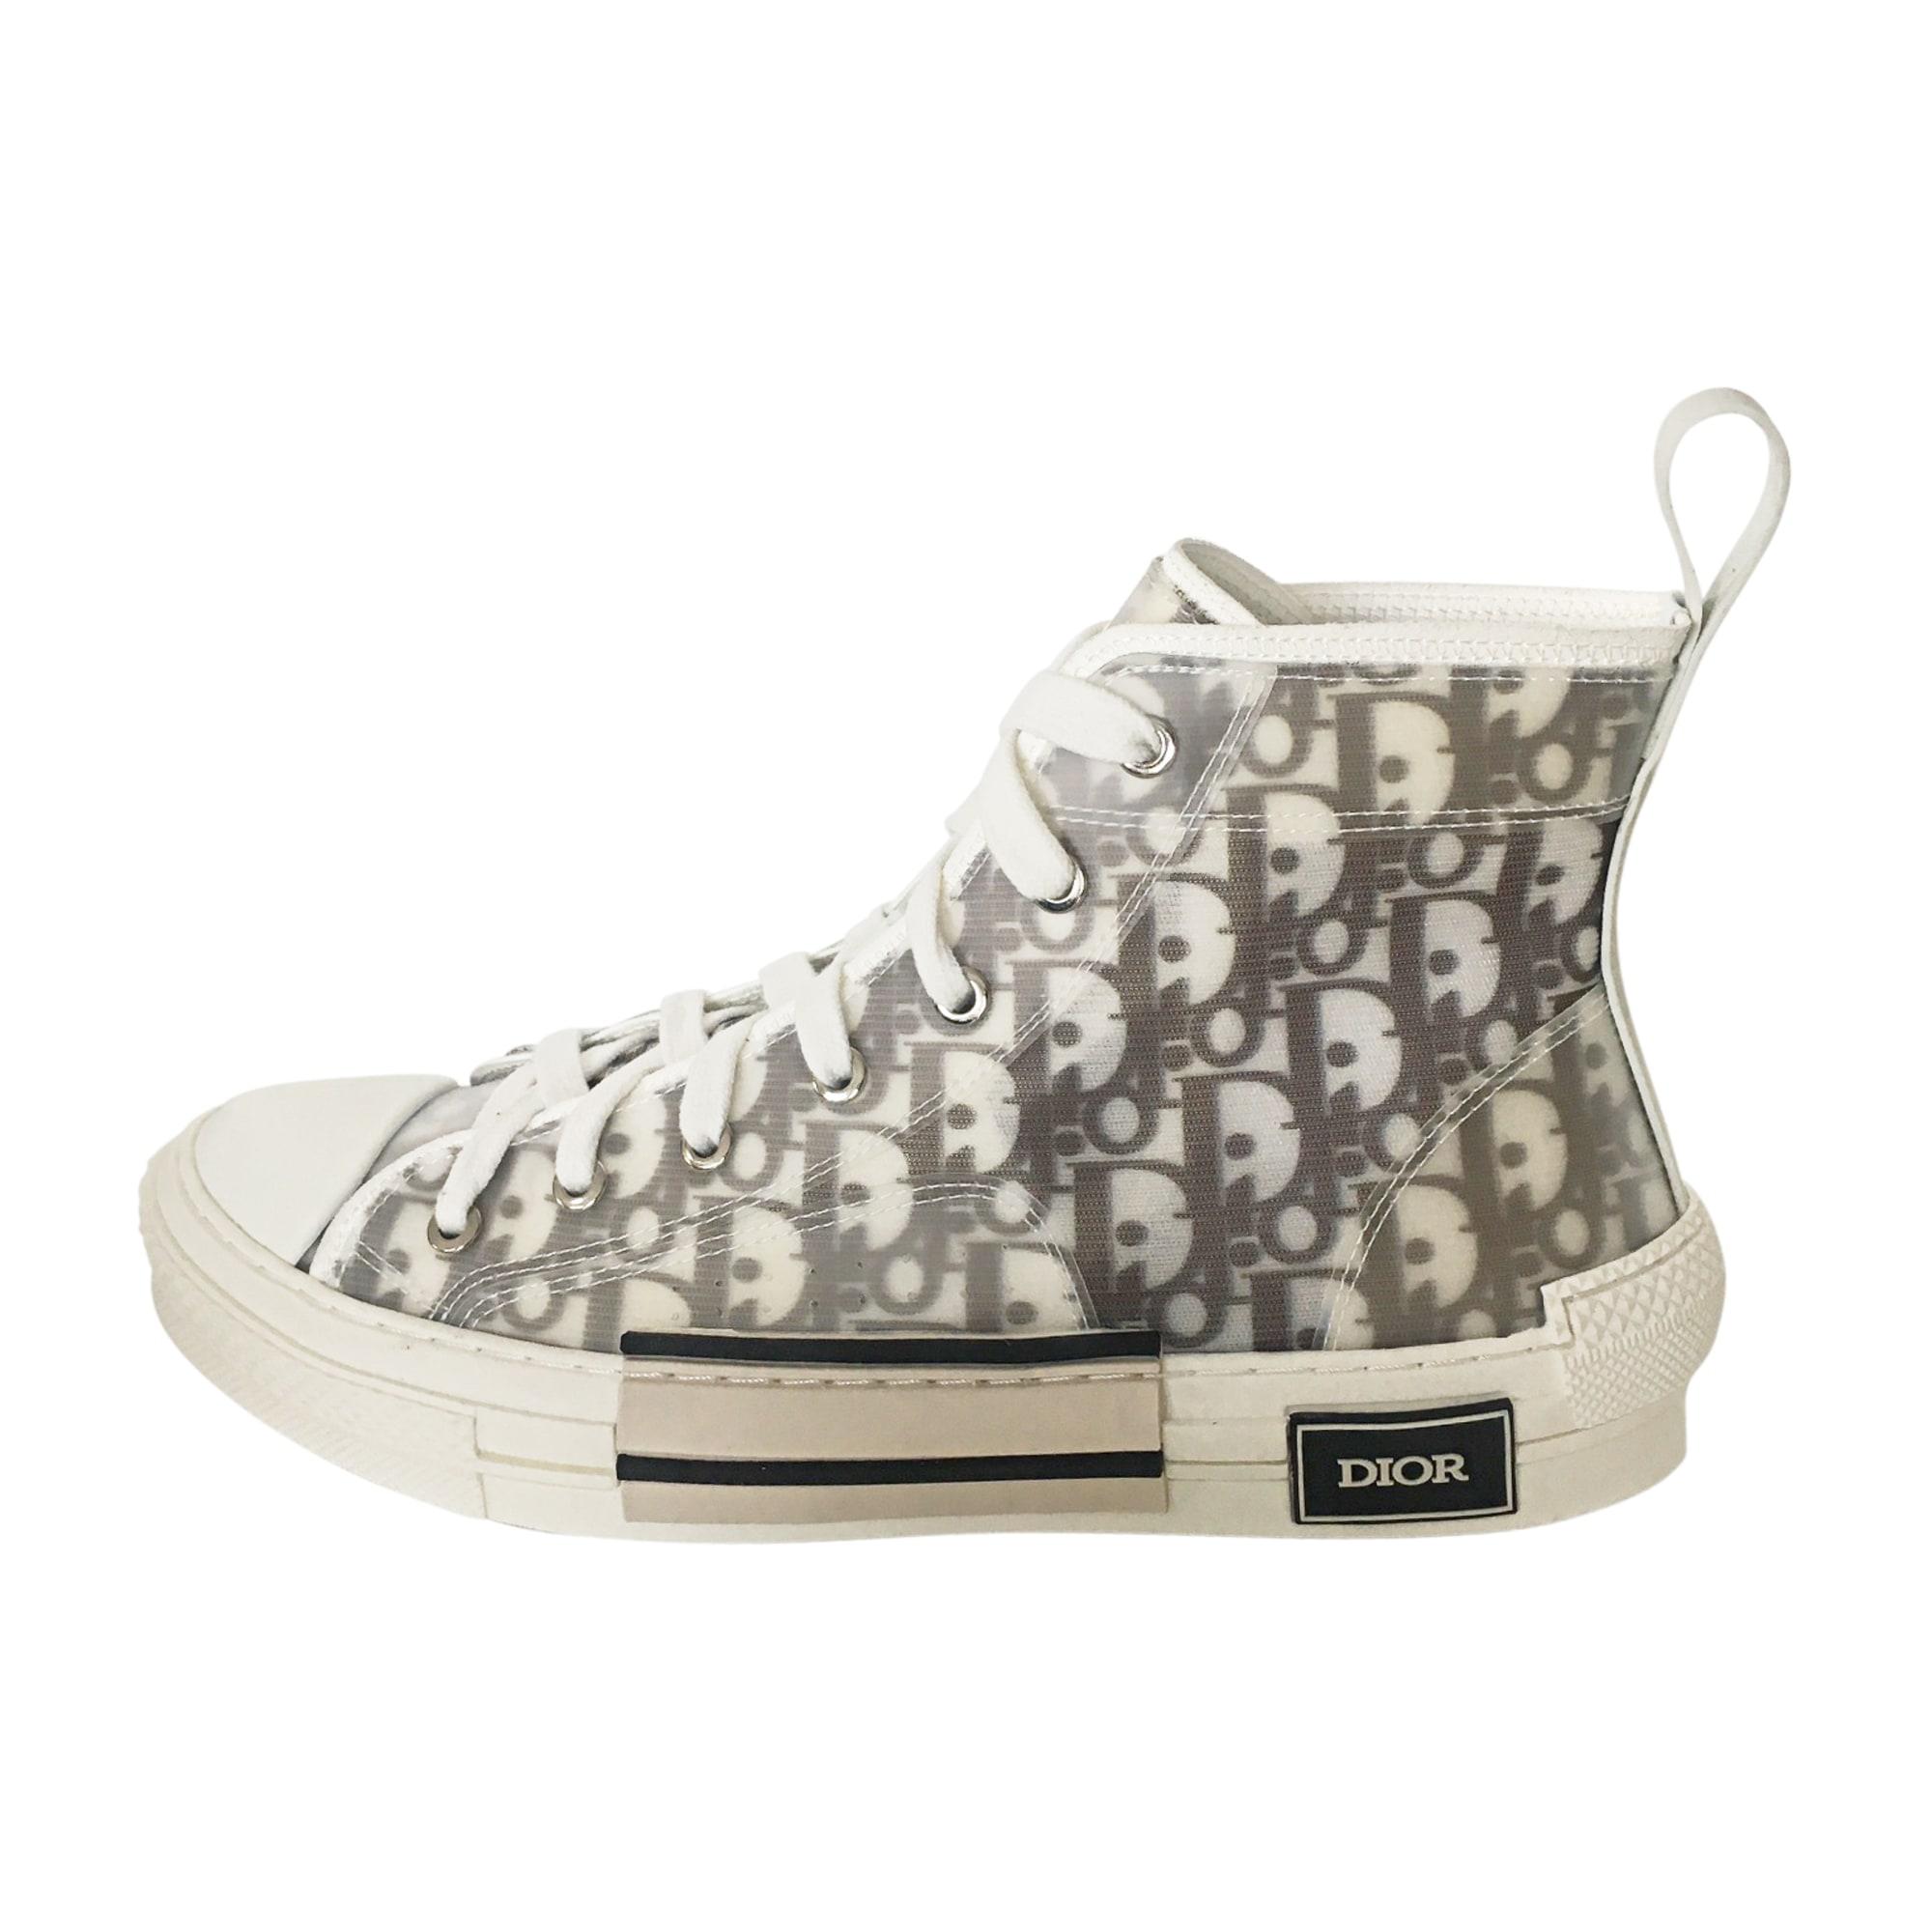 Sneakers DIOR HOMME White, off-white, ecru